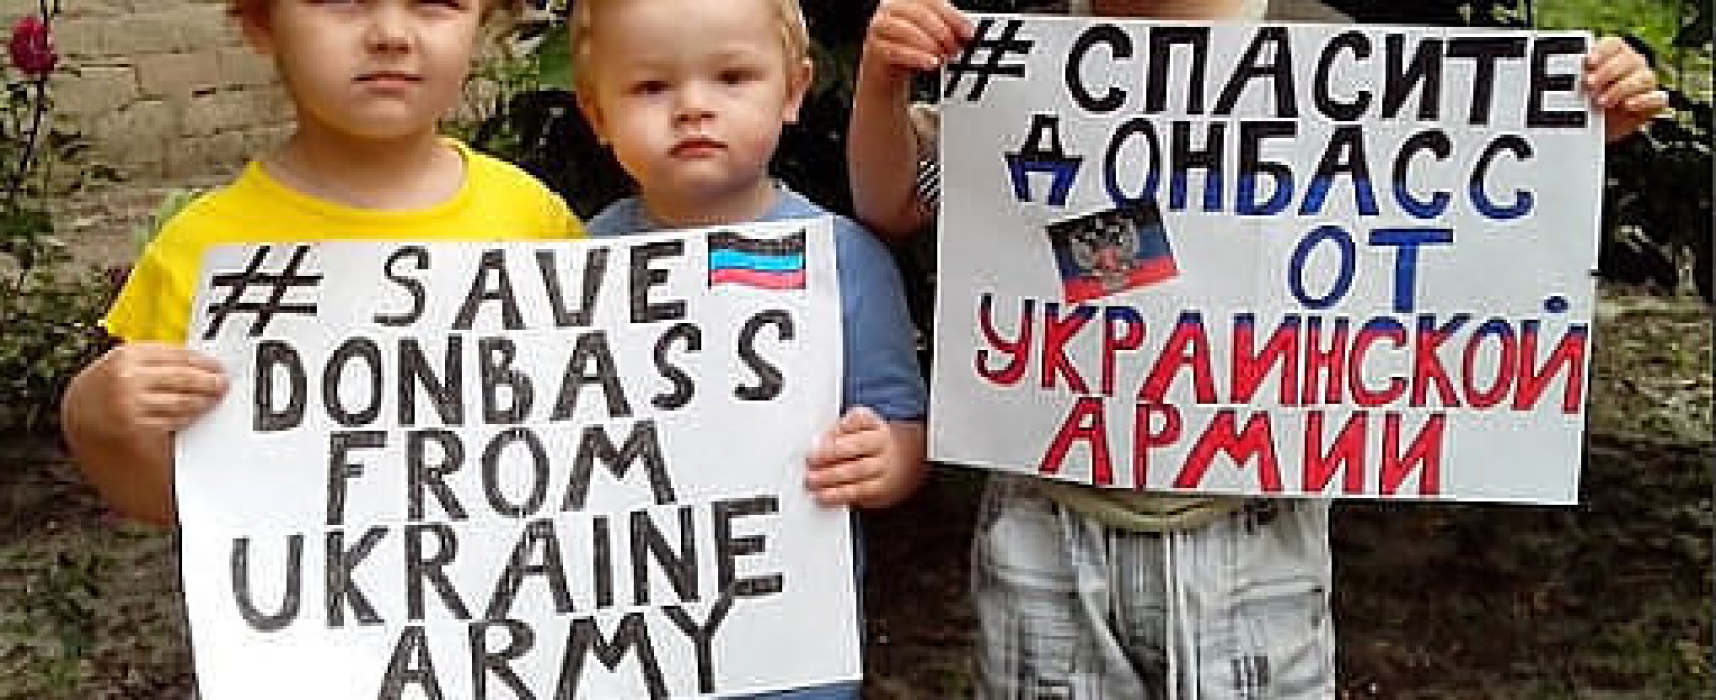 Russian propaganda: Children of Donbass in a fishbowl